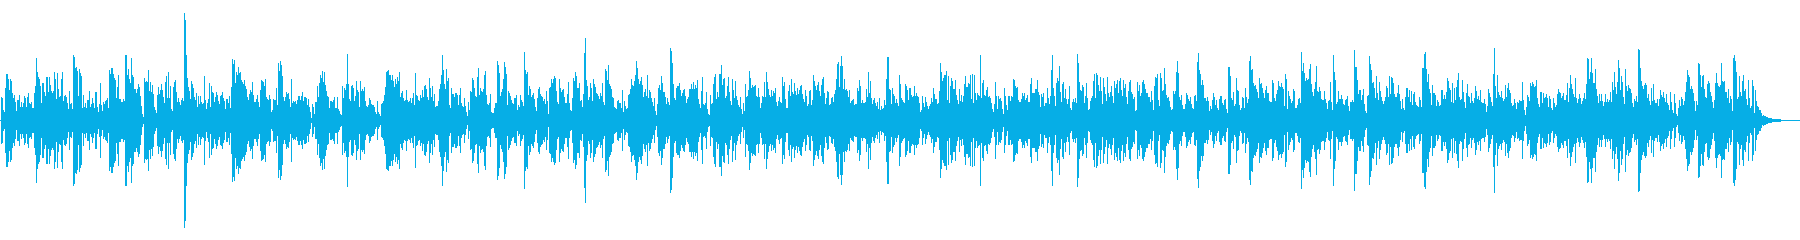 JAZZ|静寂な夜に聴きたい大人のBGMの再生済みの波形